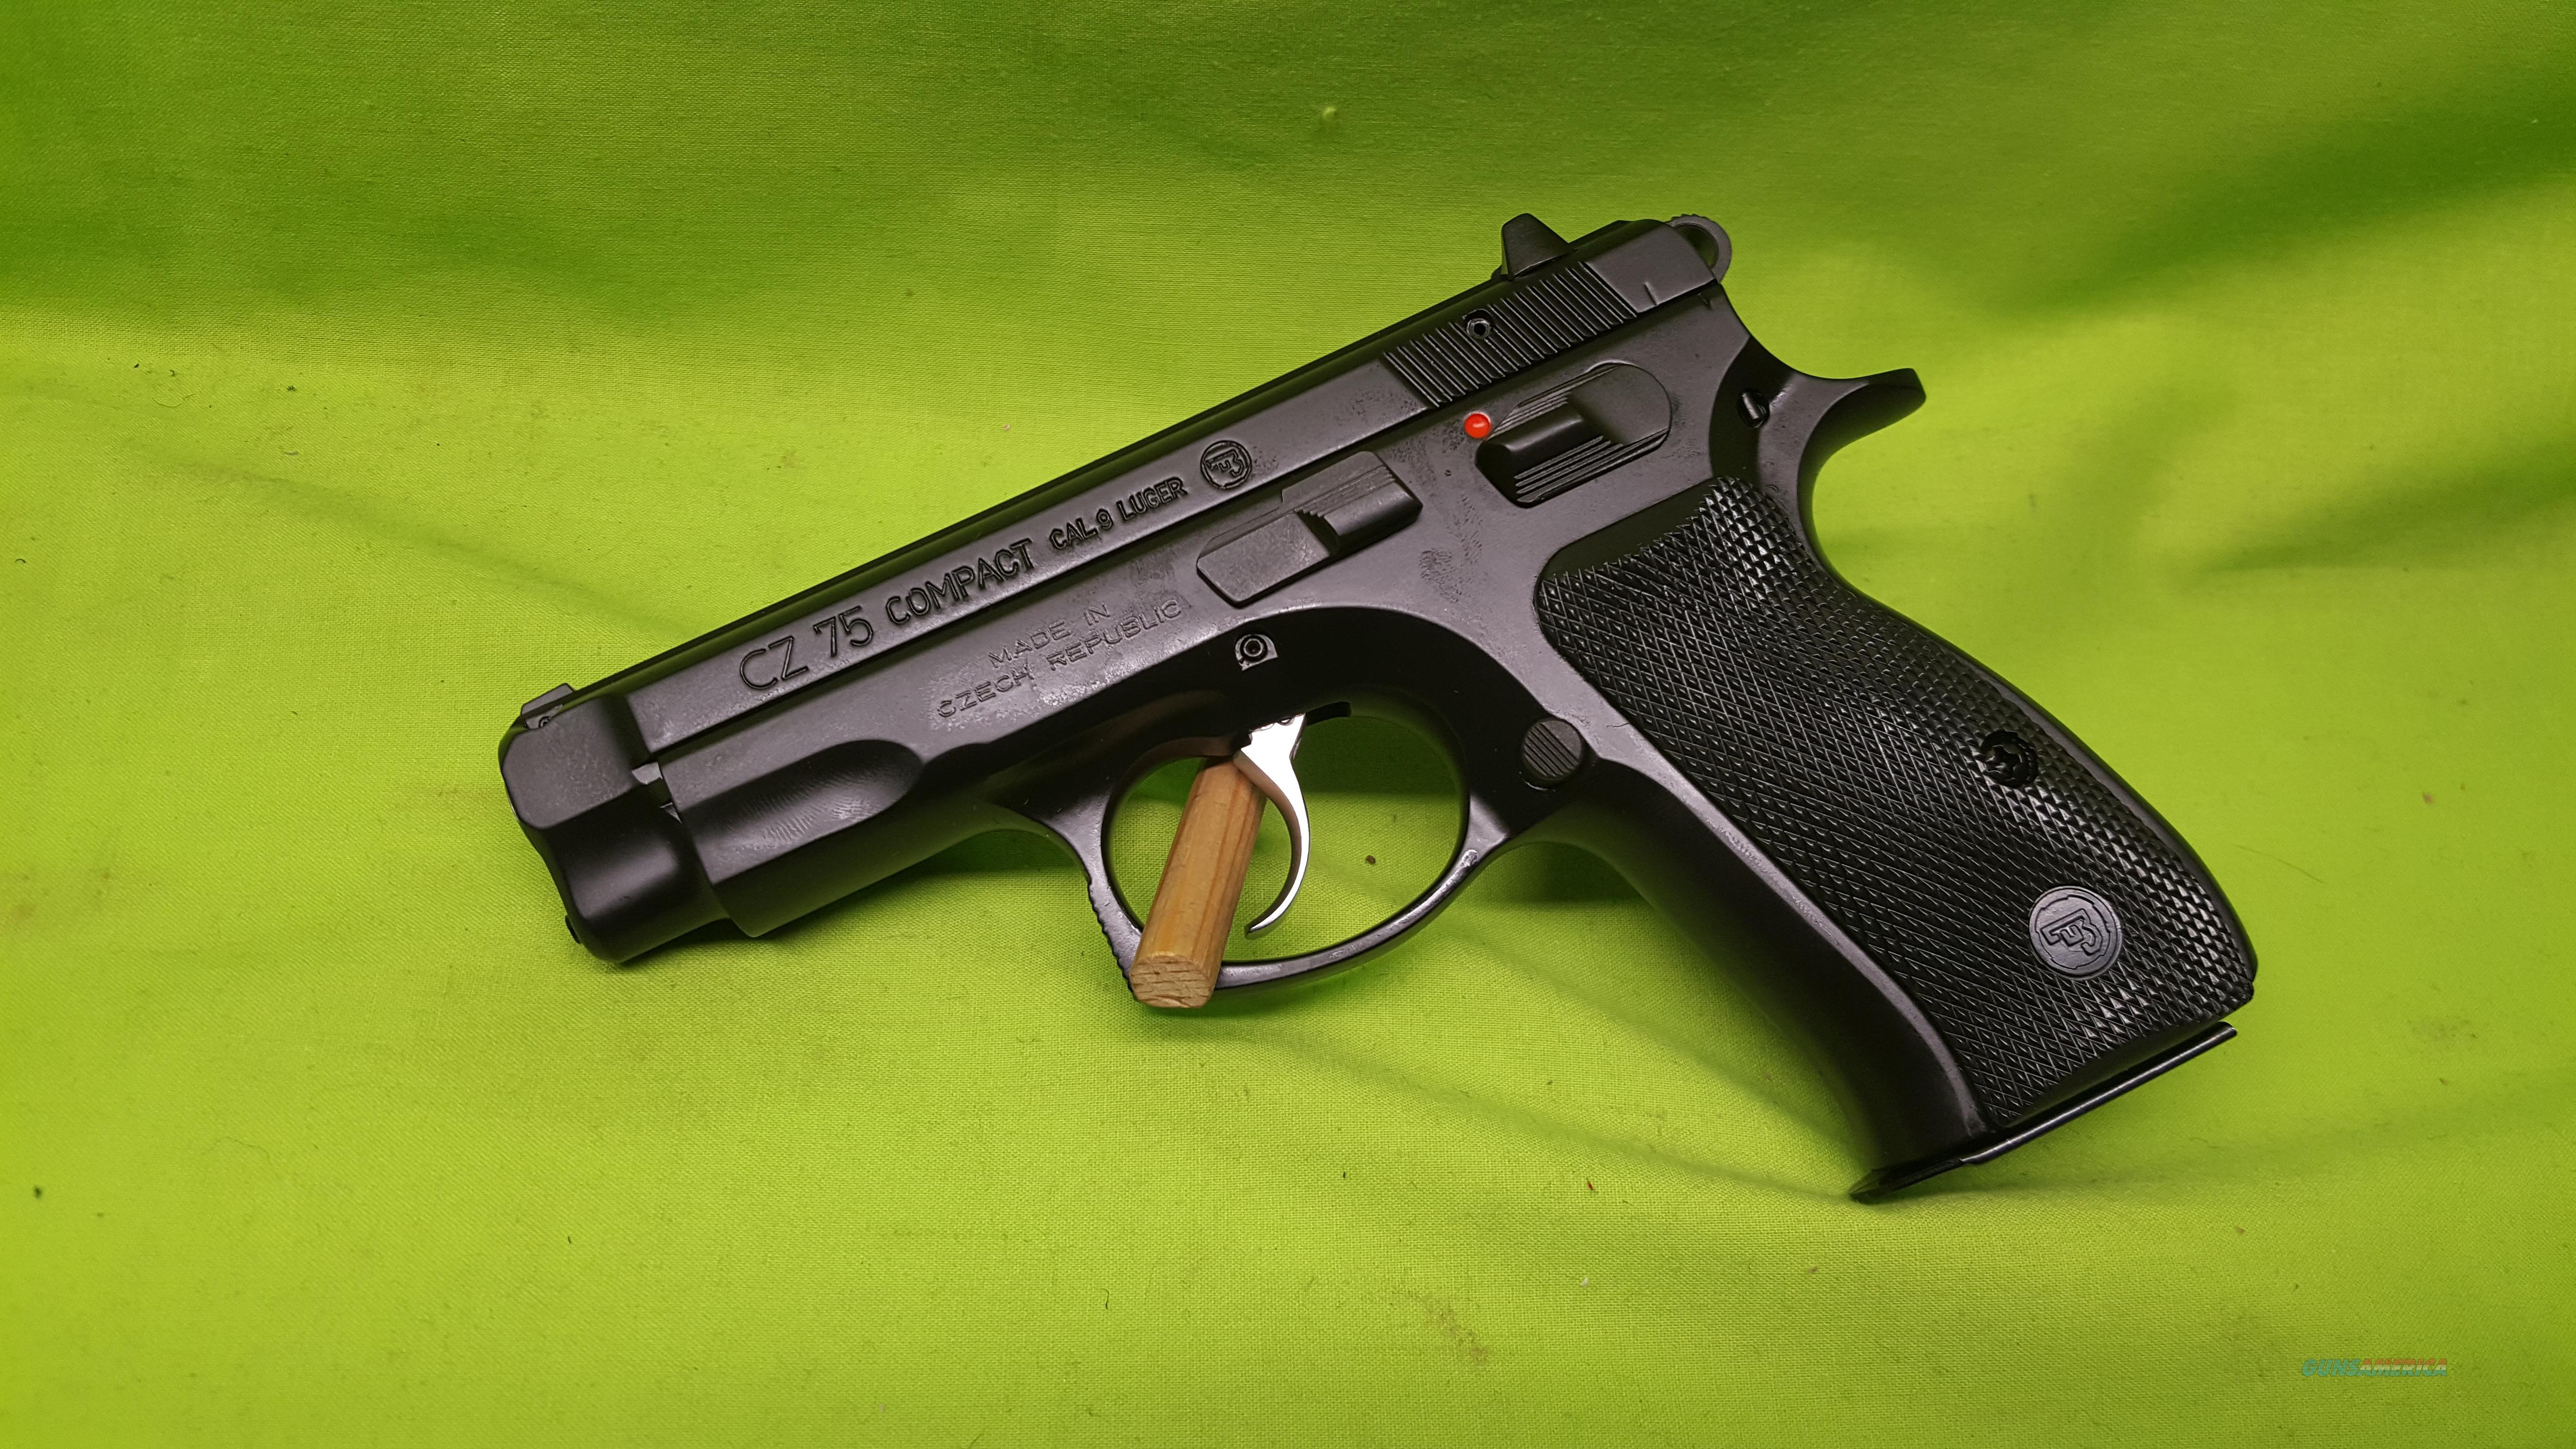 "CZ 75 COMPACT 75C 9MM 3.9"" BLK 2-14RD STEEL 91190  Guns > Pistols > CZ Pistols"